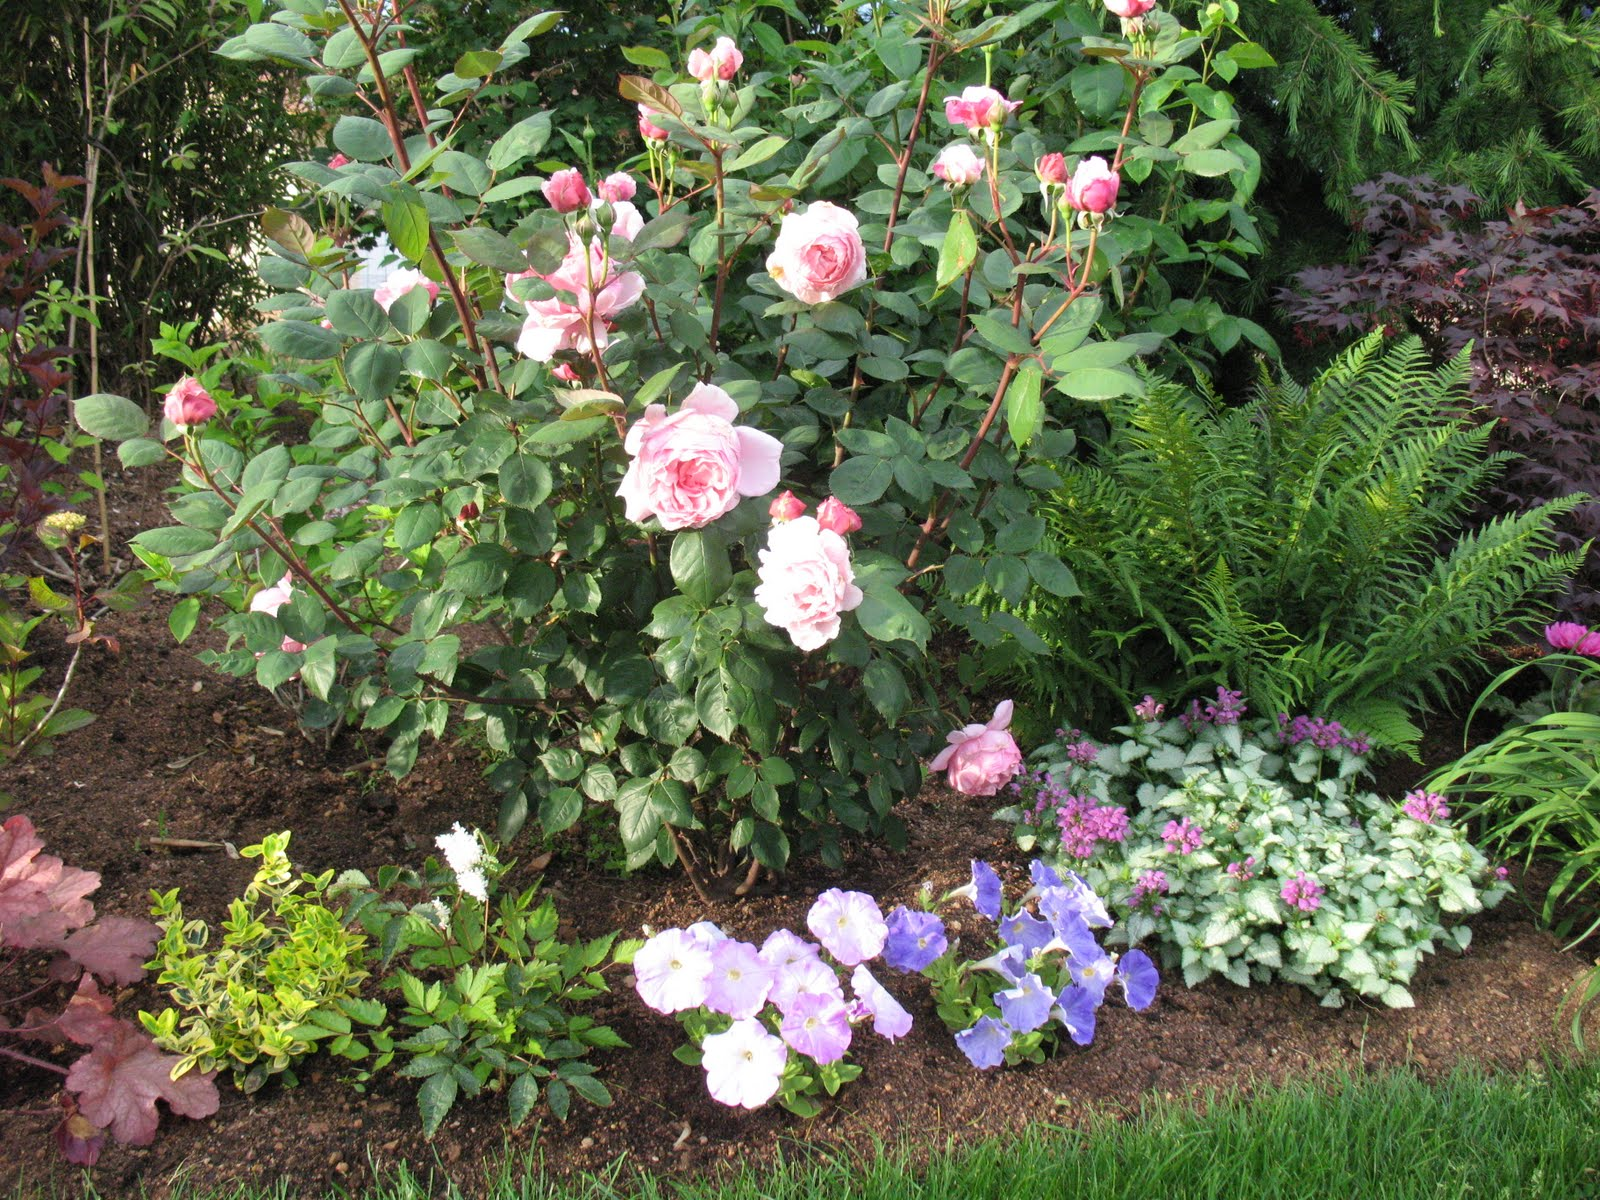 Roses du jardin ch neland acer palmatun bloodgood for Decoration jardin rosier